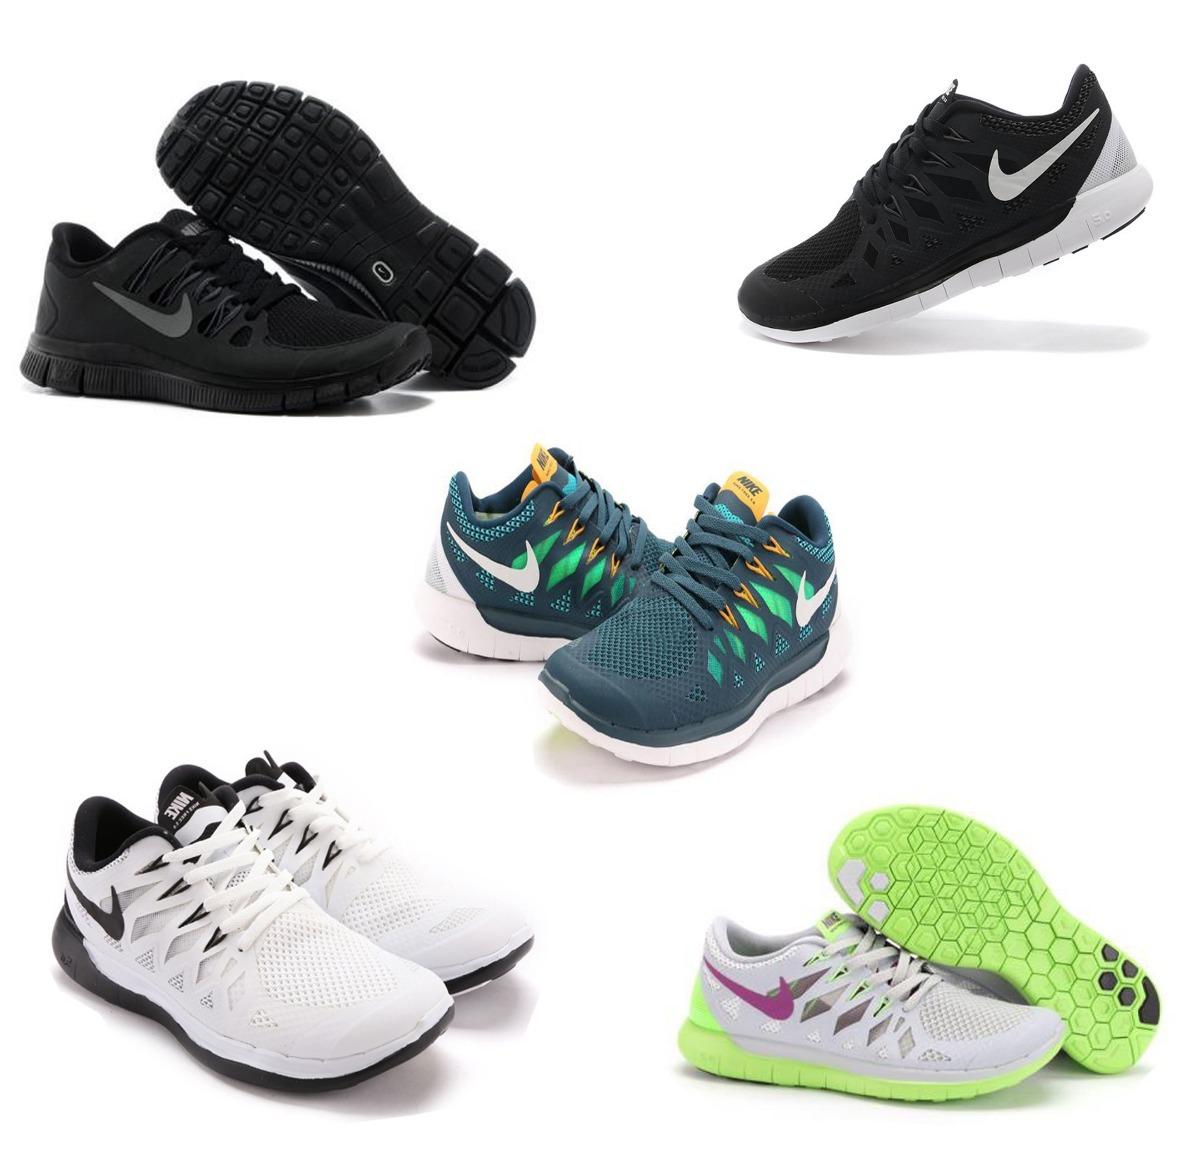 best service 0eb4a a7847 Oferta Zapatos Nike Free, 5.0 Caballero, Dama, 35 A La 42 -